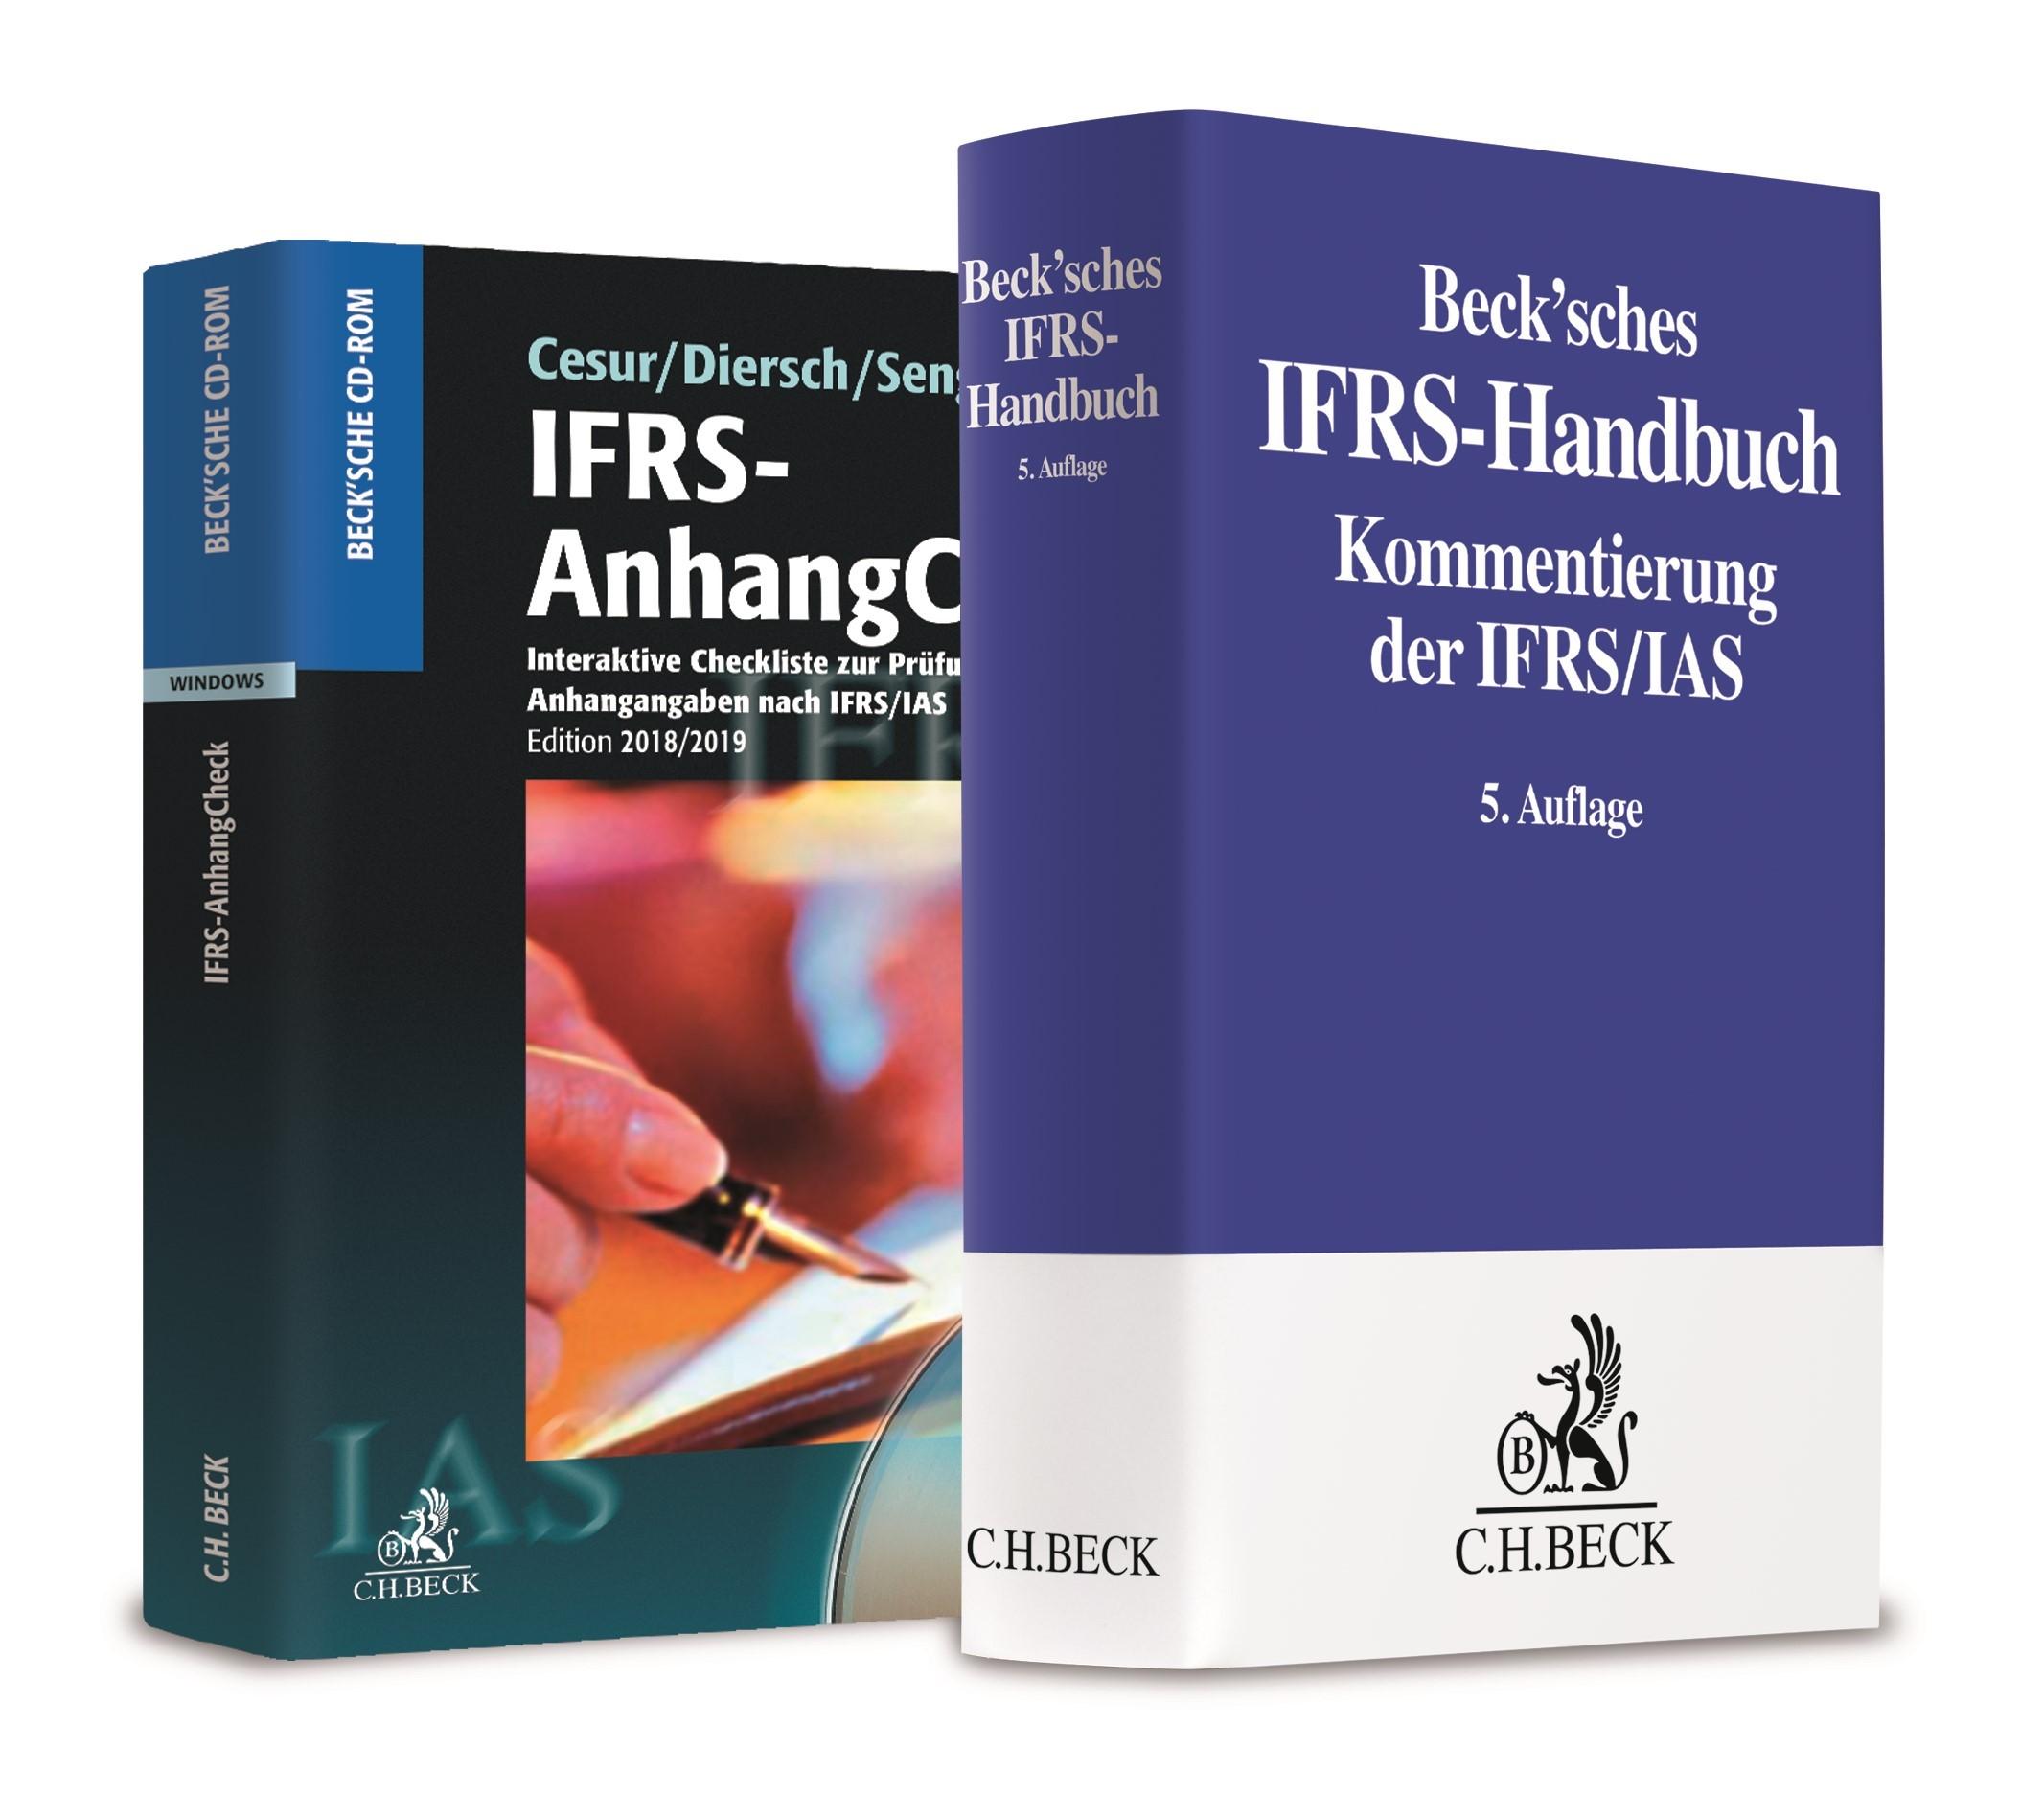 Beck'sches IFRS-Handbuch 5. Auflage 2016 + IFRS-AnhangCheck 2018/2019 • Set | Cesur / Diersch / Senger, 2019 (Cover)